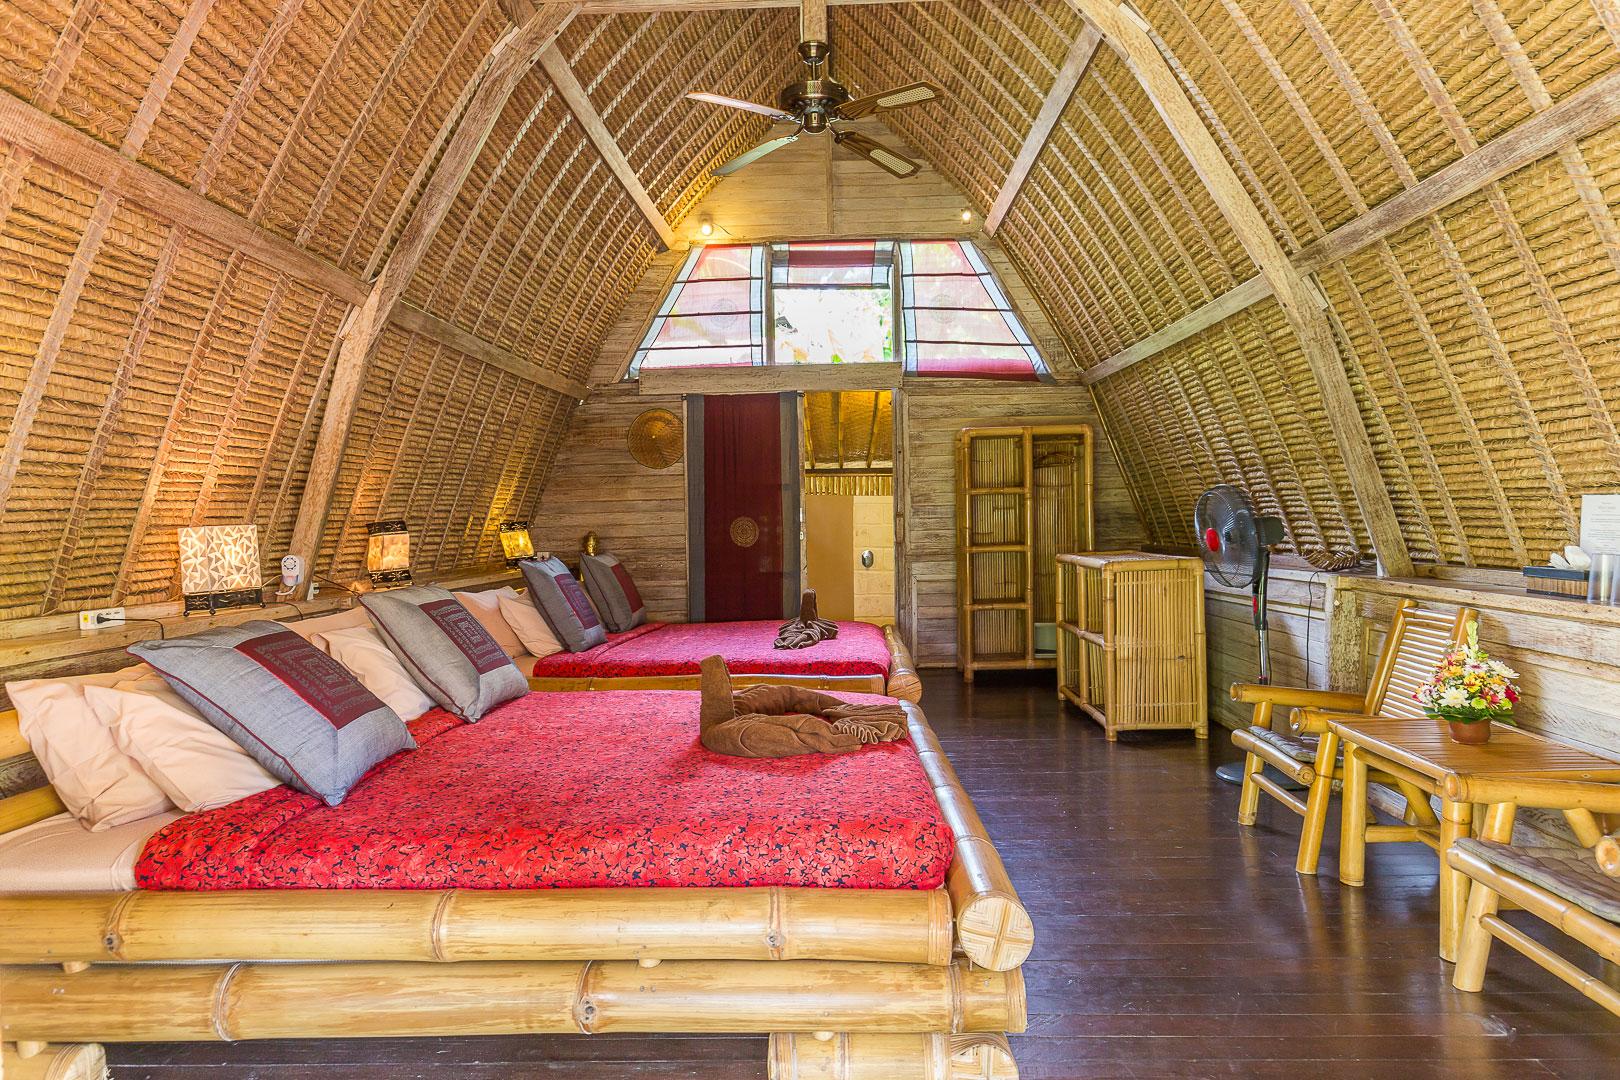 Location-bungalows-maison-hote-hotel-milos-home-L7-rhodochrosite-7